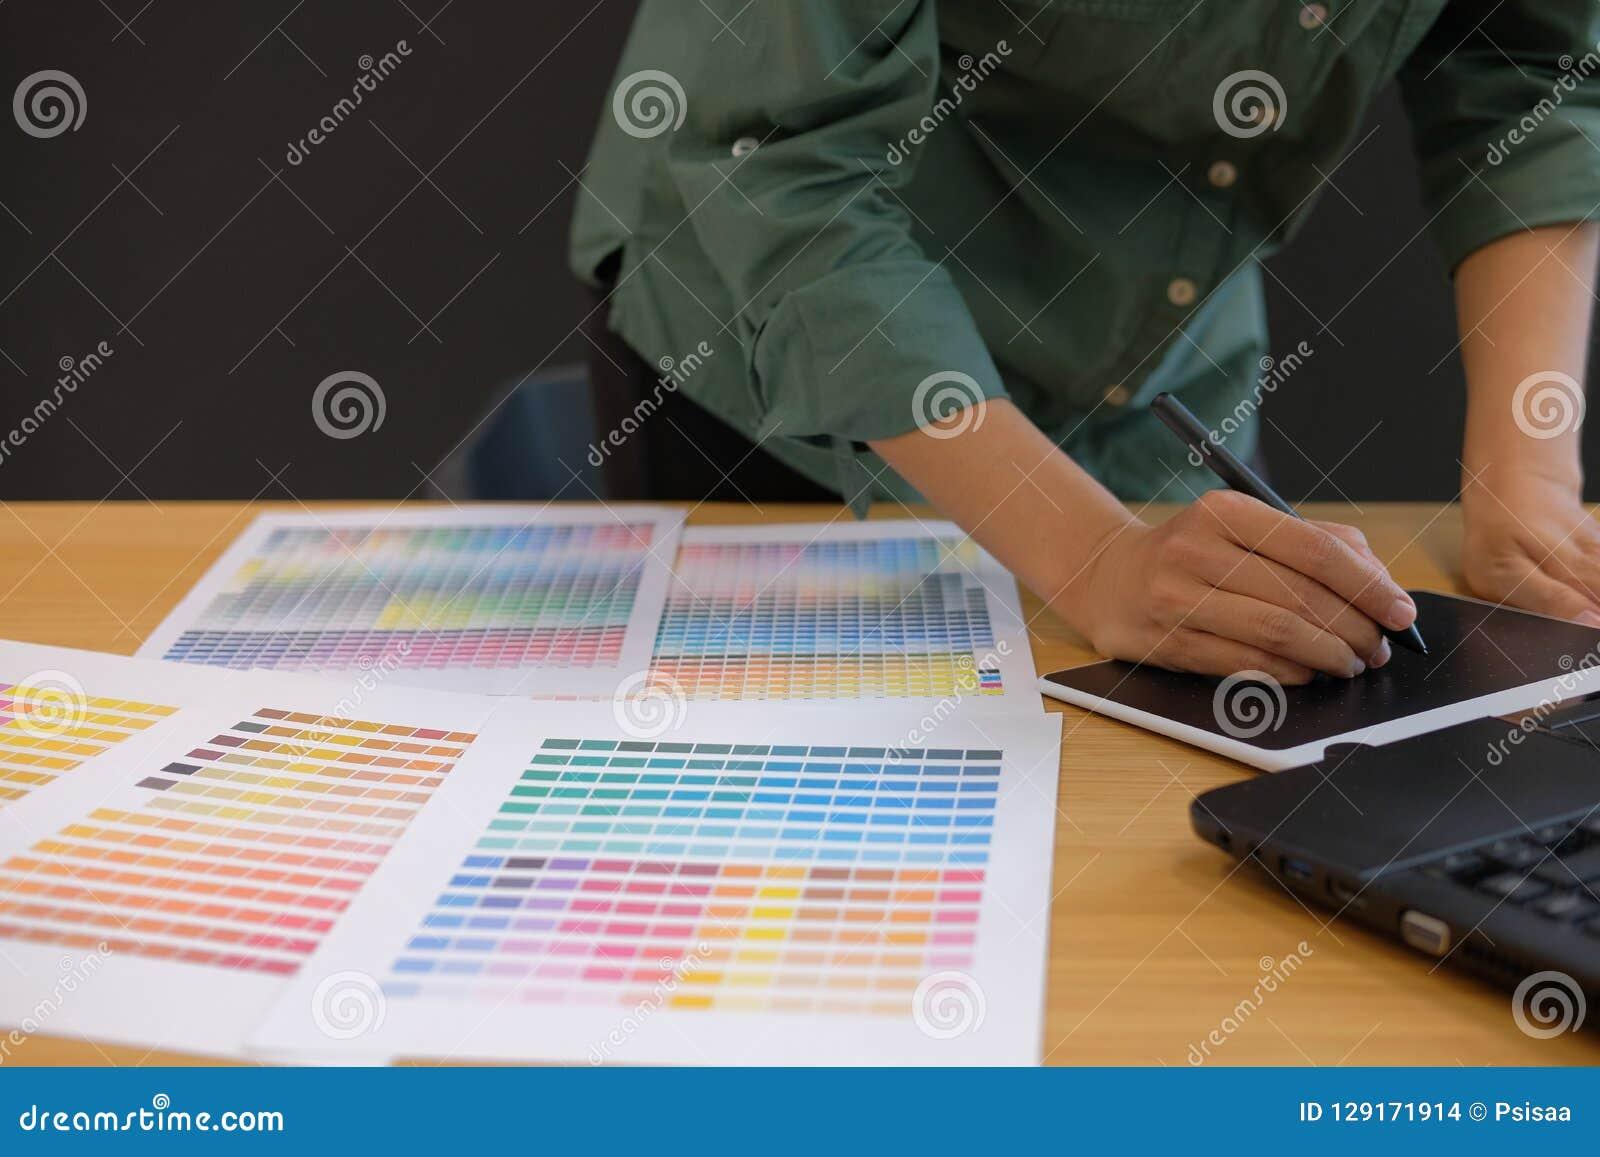 graphic interior designer working with computer. creative man dr